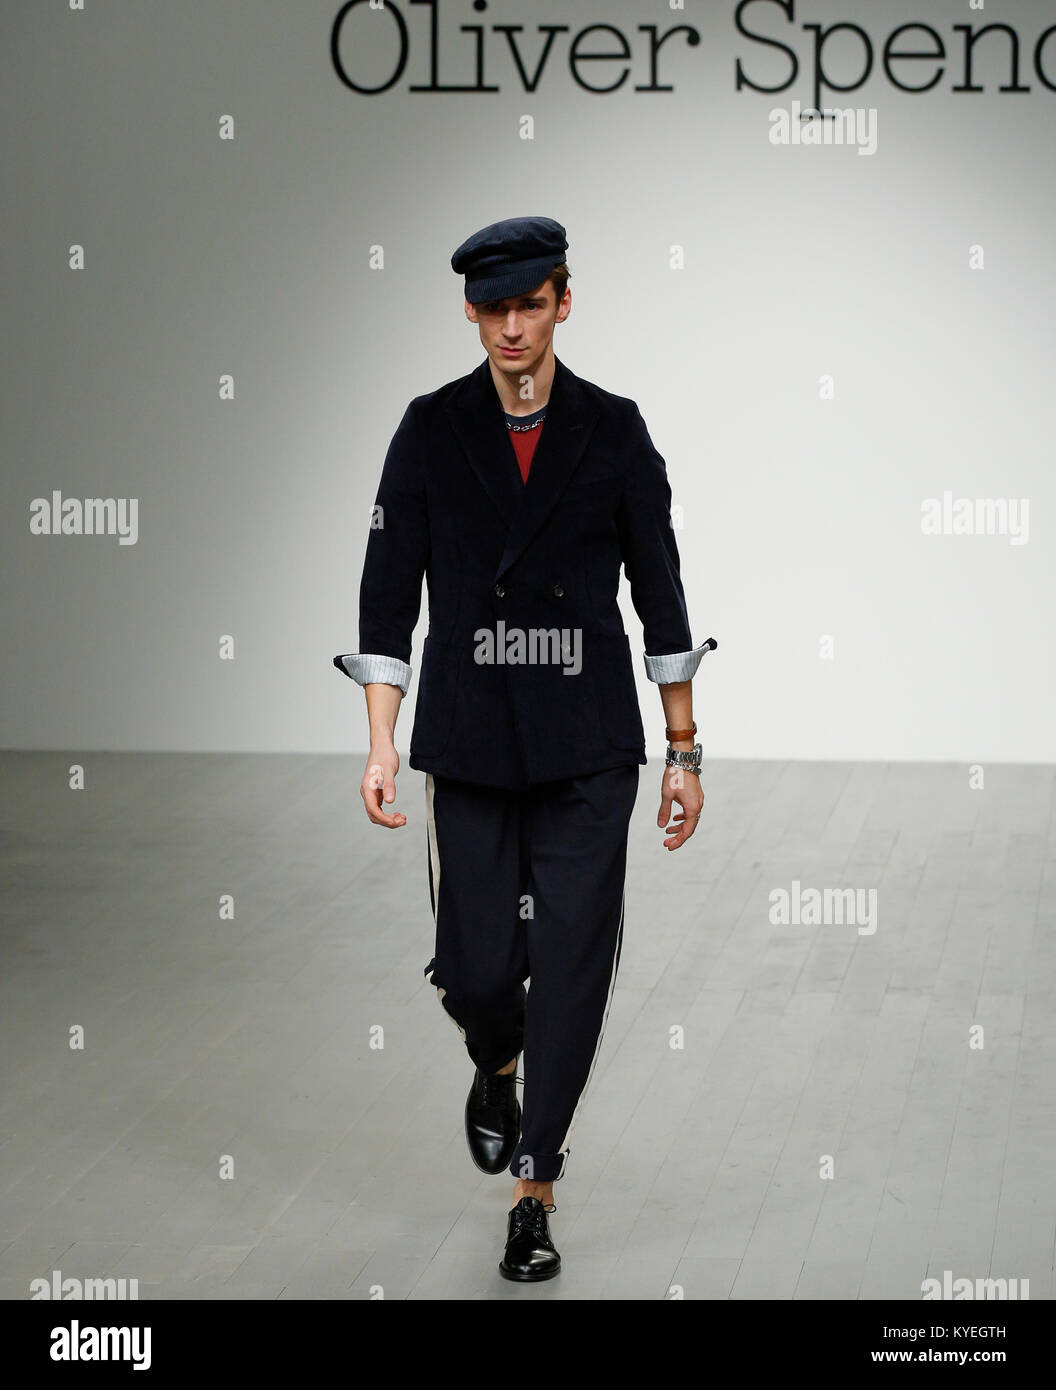 Best of British: Fashion Designers - Farfetch 51